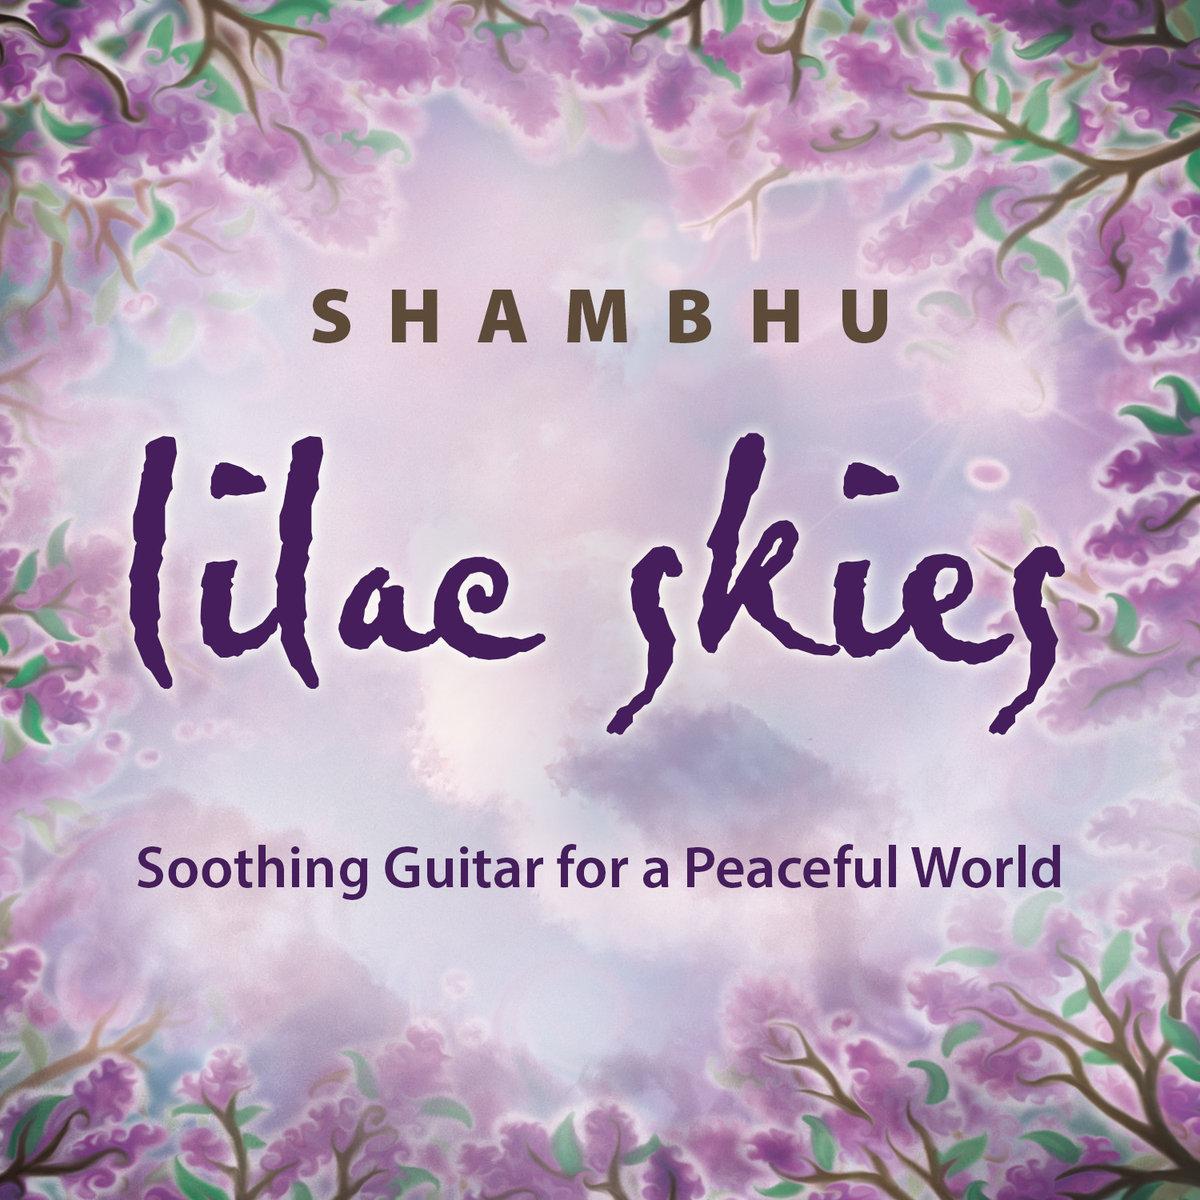 Lilac Skies 1200 x 1200 cover art.jpg